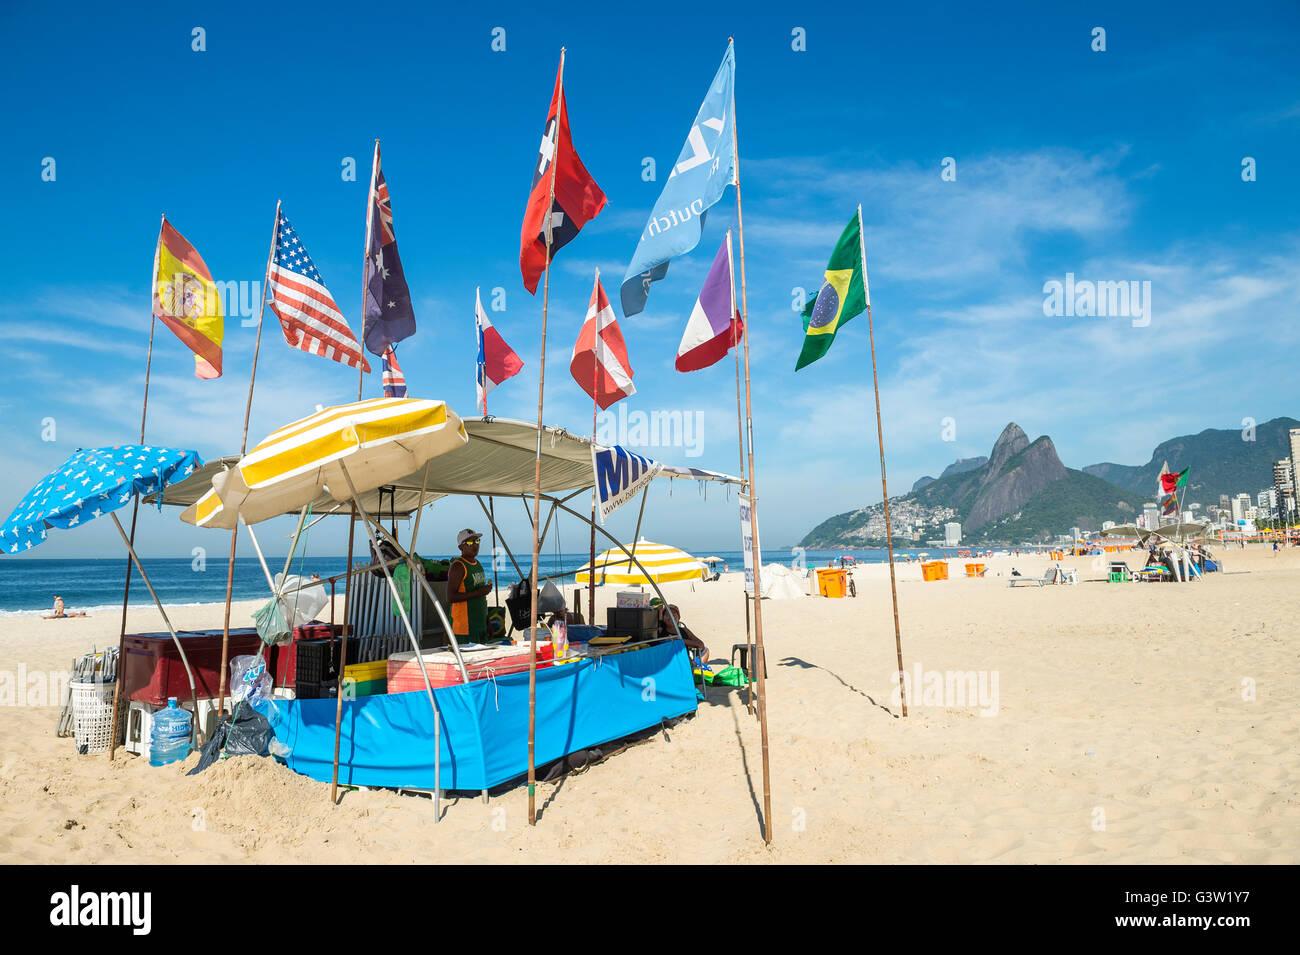 RIO DE JANEIRO - APRIL 4, 2016: International flags fly above a barraca (Brazilian beach shack) on Ipanema Beach. - Stock Image